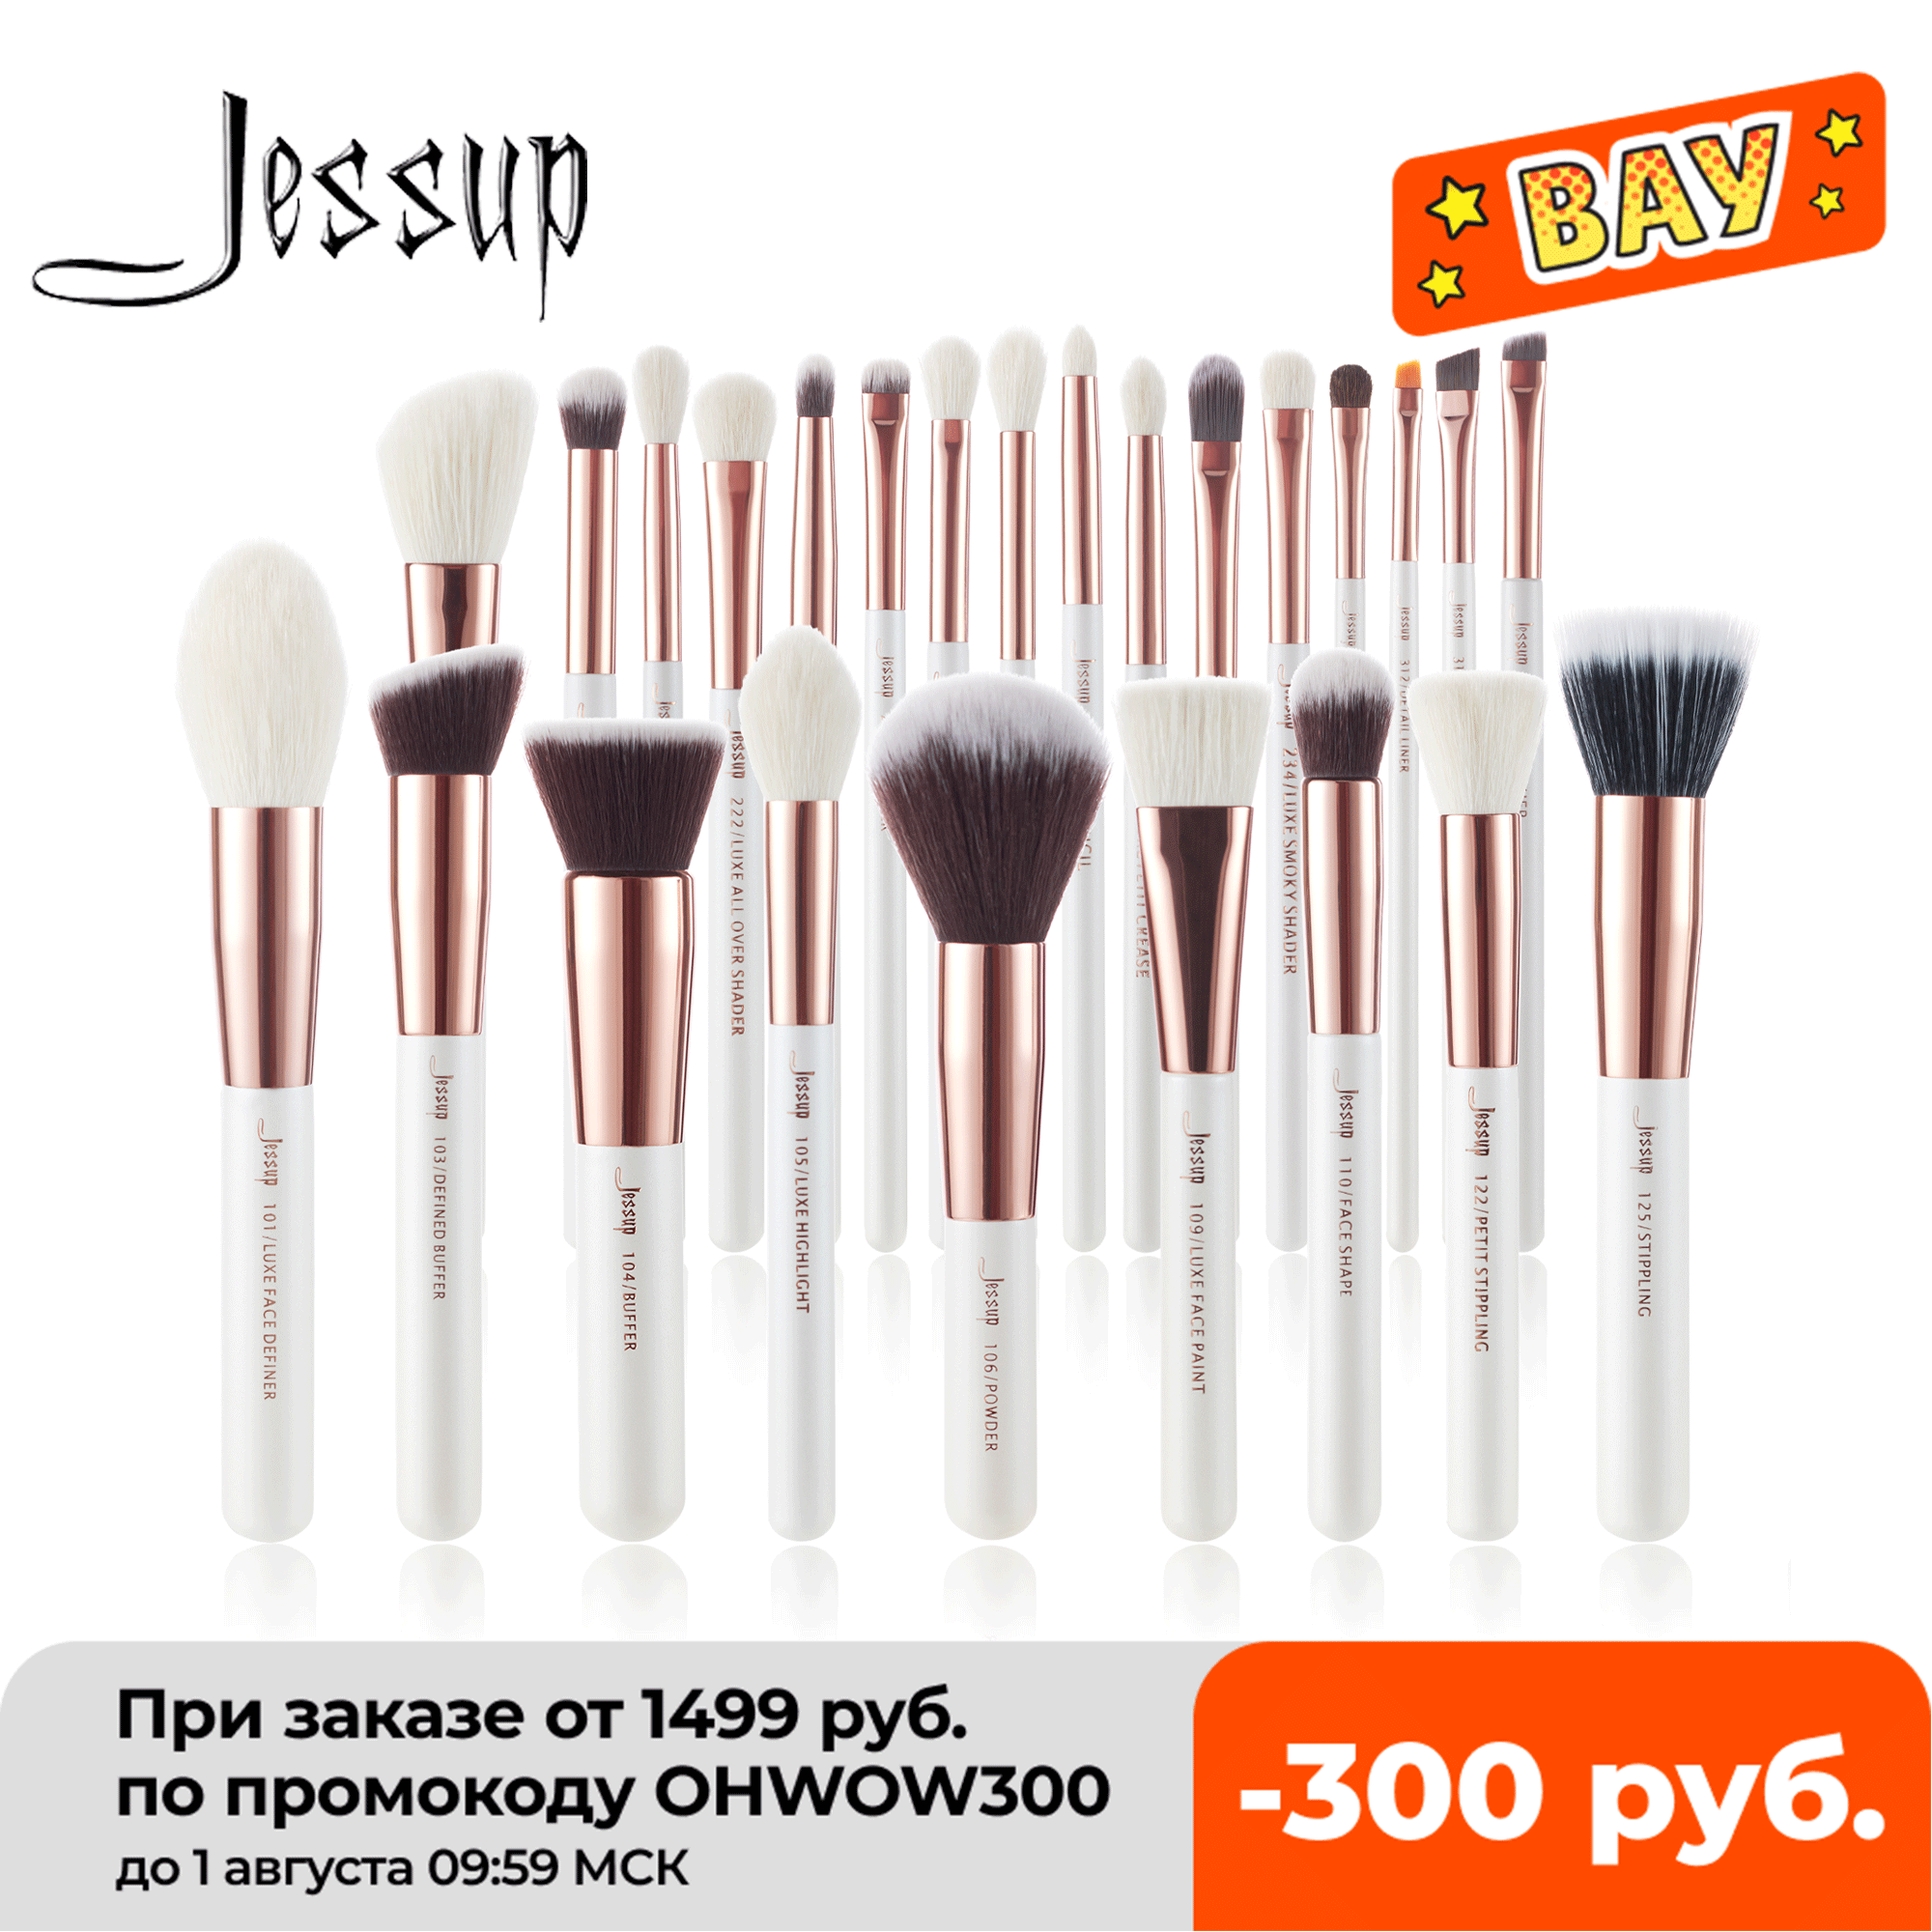 Jessup Makeup brushes set Pearl White / Rose Gold  1